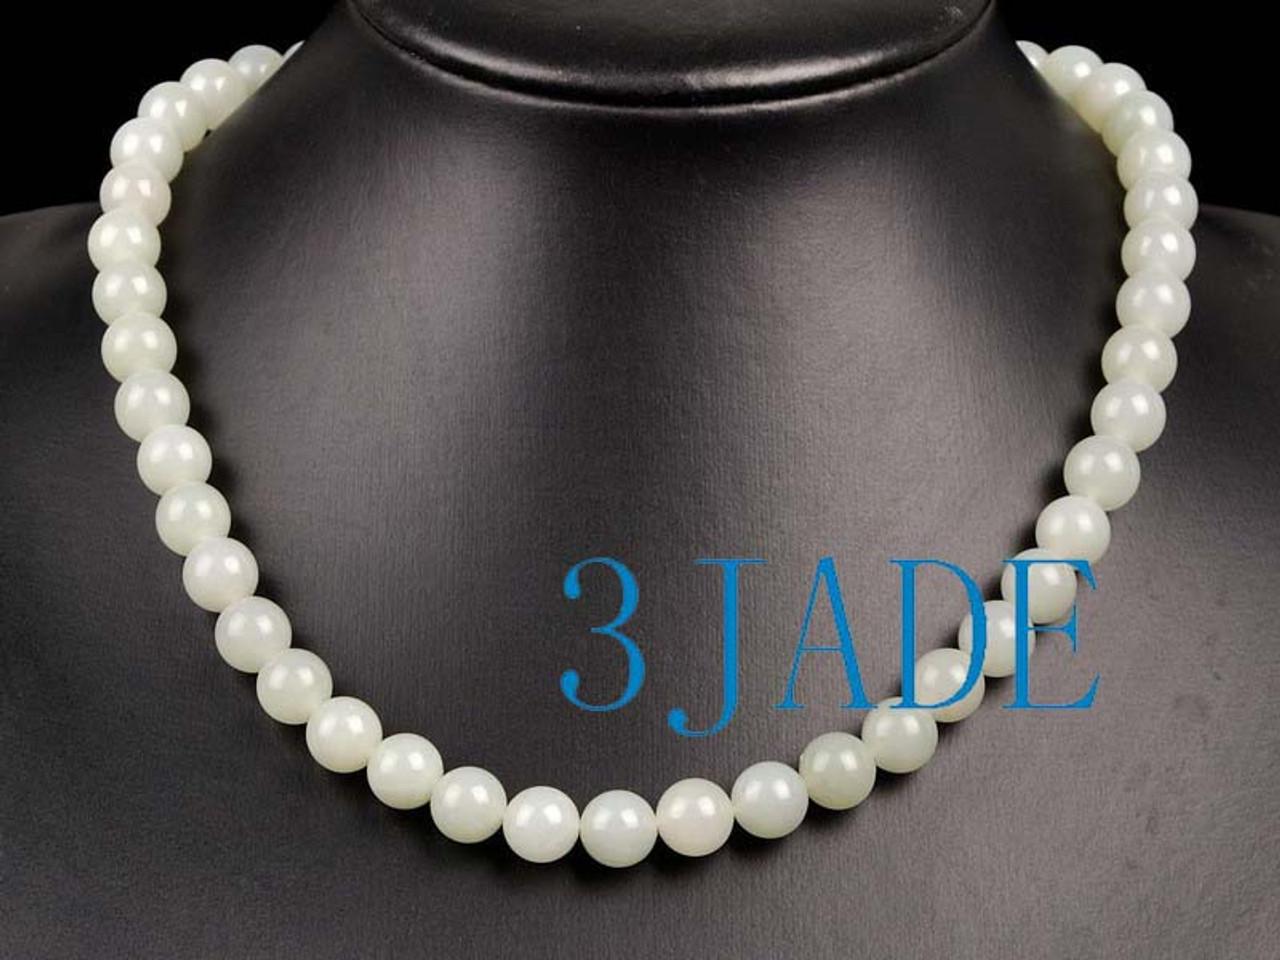 Jade Beads Necklace